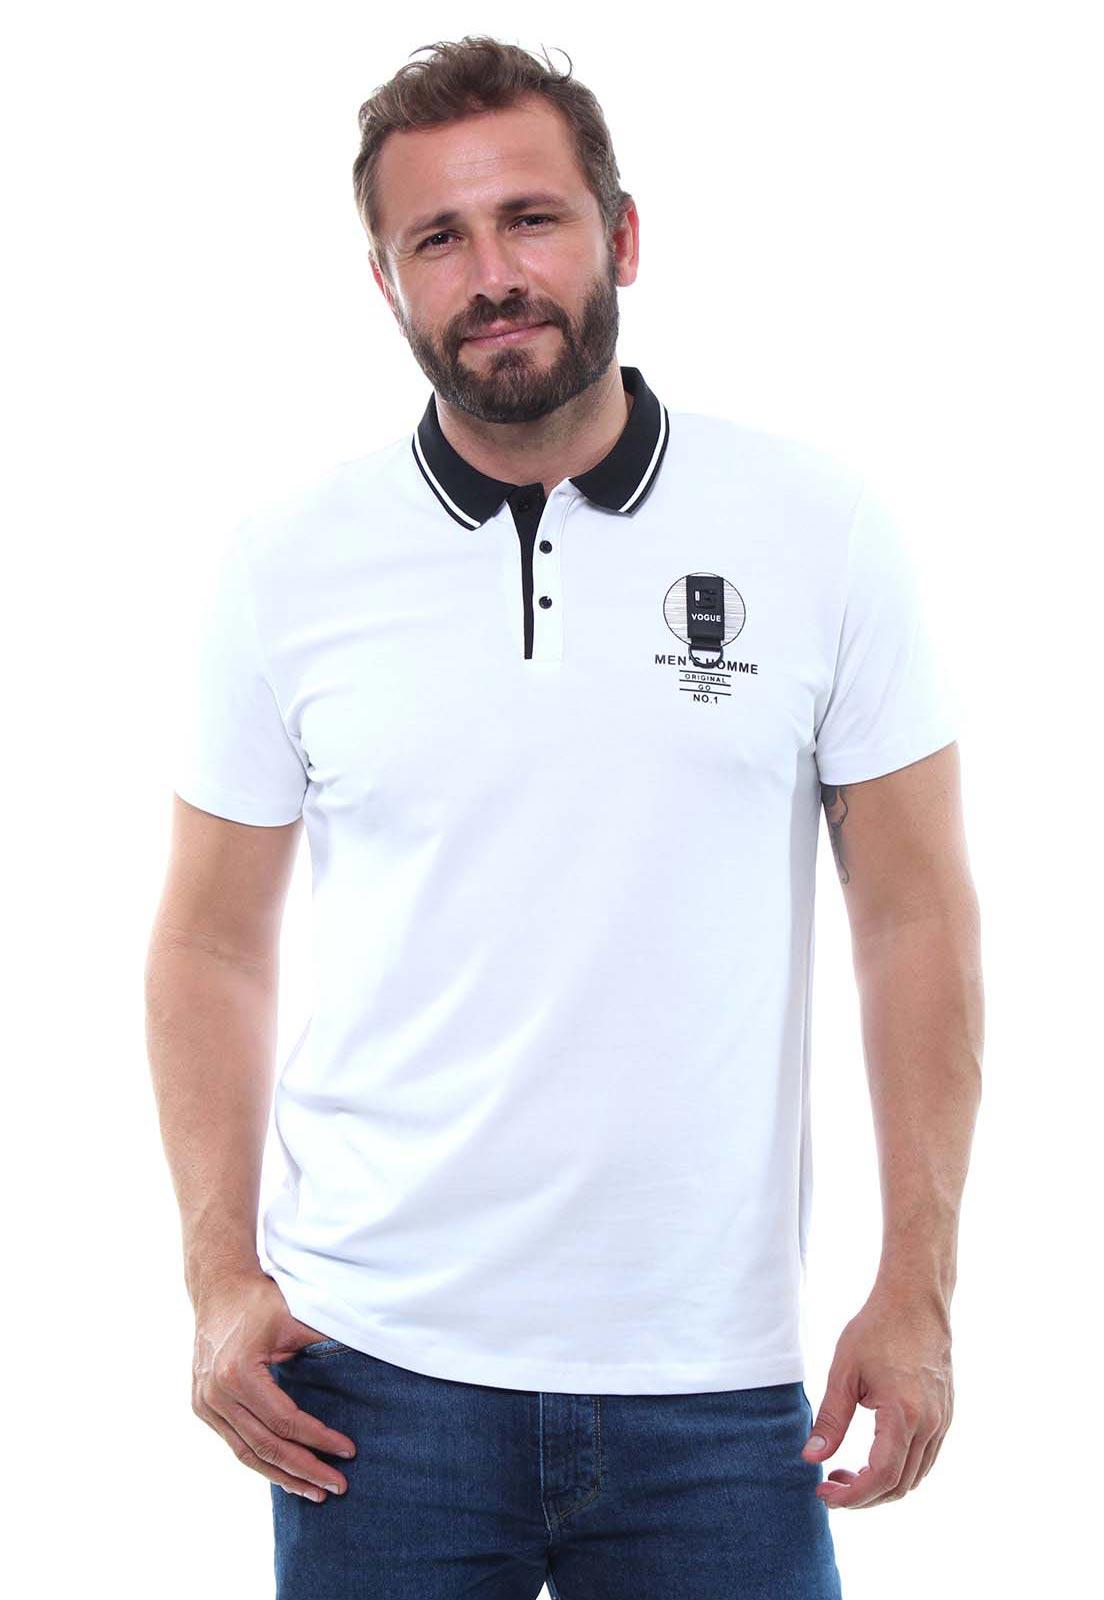 Camisa Gola Polo Masculina Manga Curta Crocker - 47853  - CROCKER JEANS